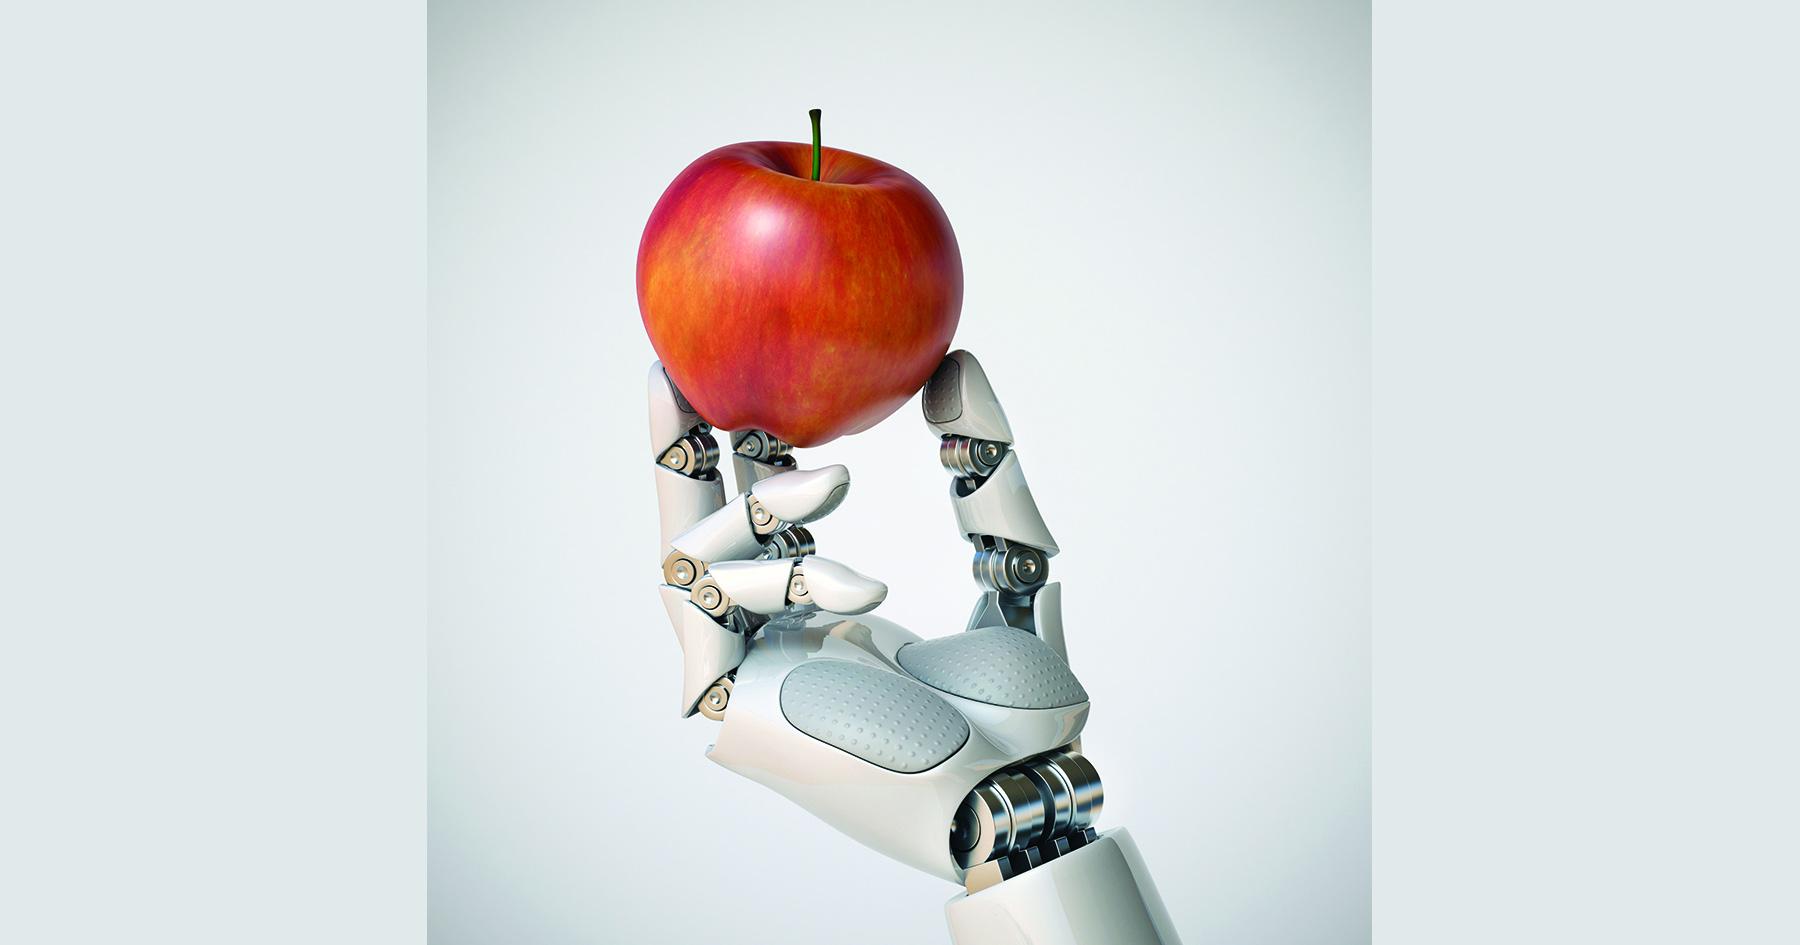 robot apple